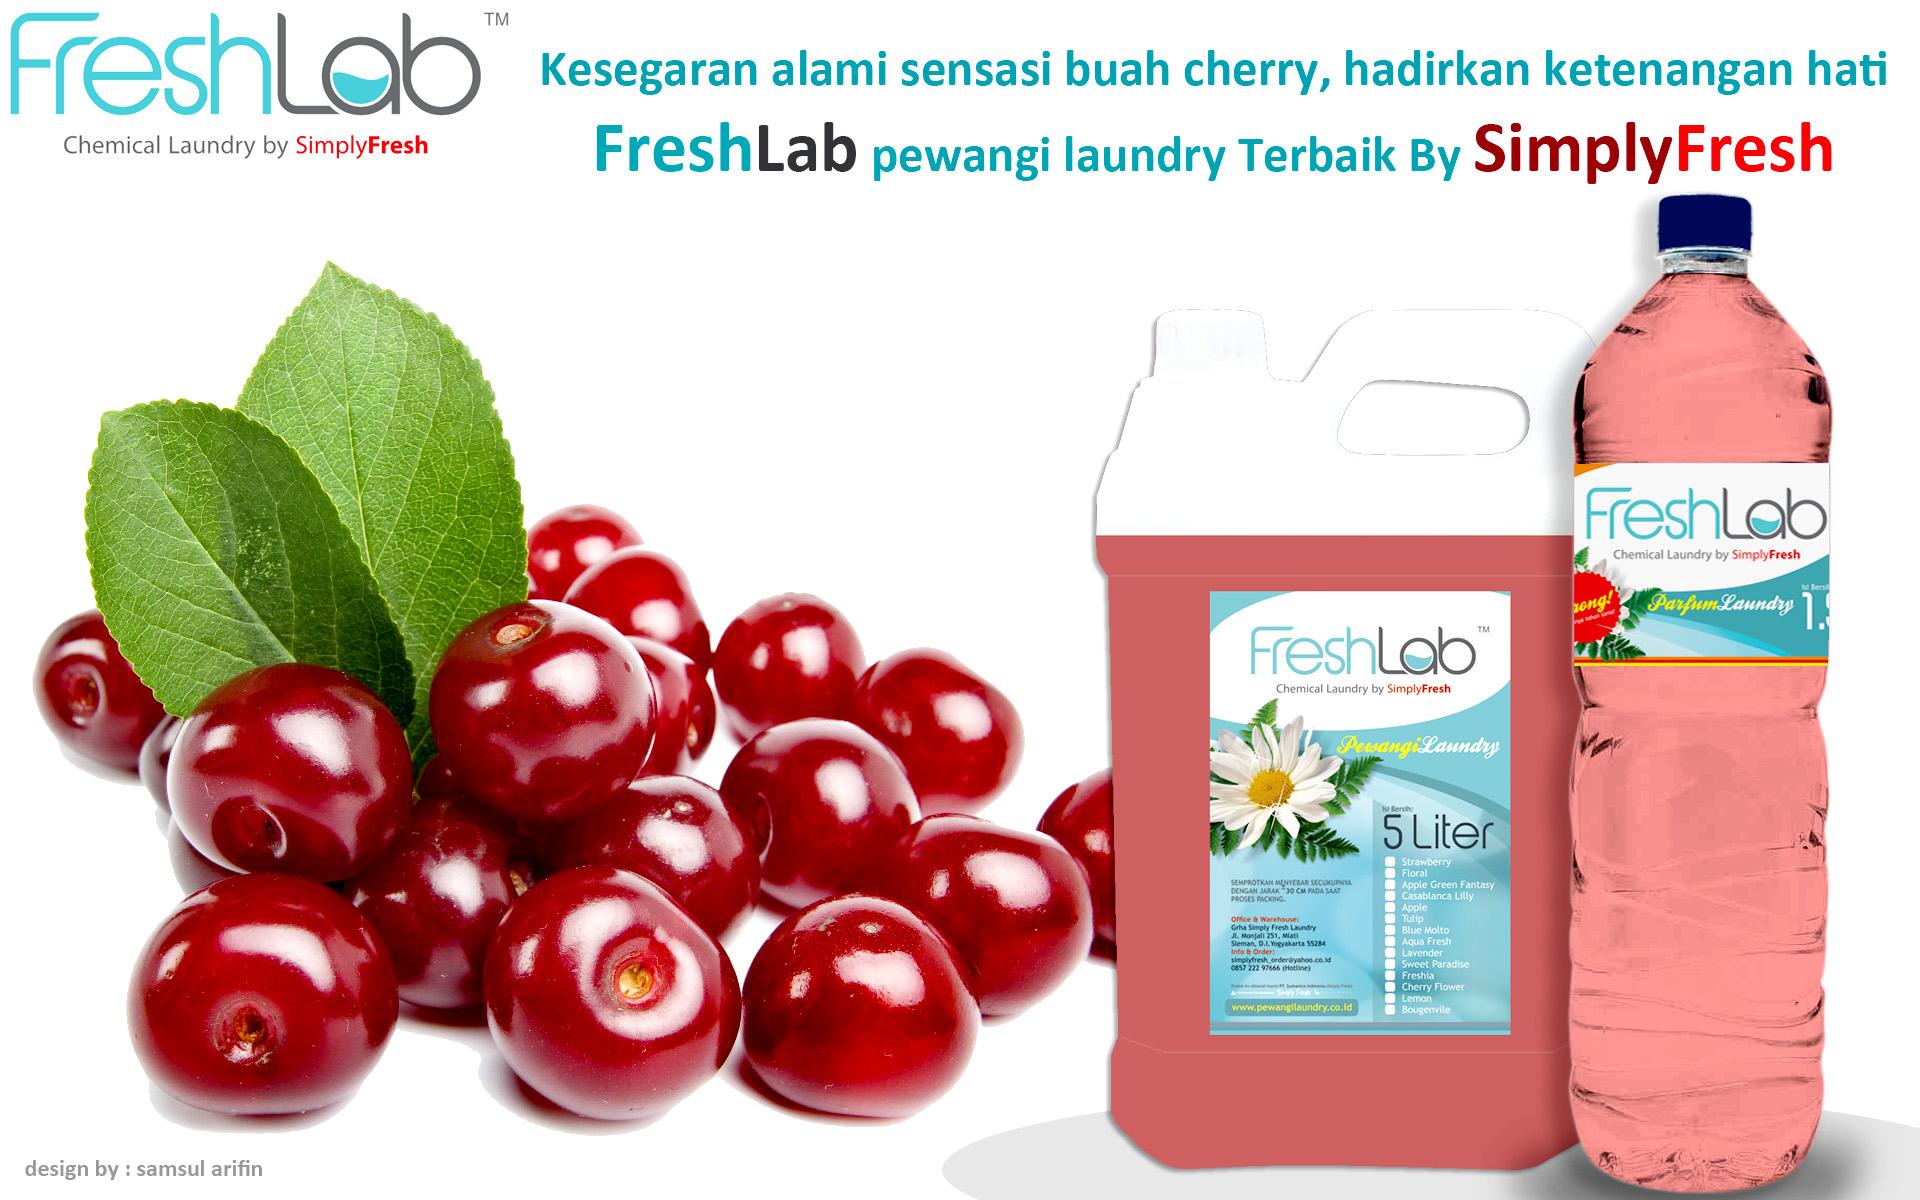 Jual Distributor Pewang Laundry Jakarta Utara Freshlab Pewangi